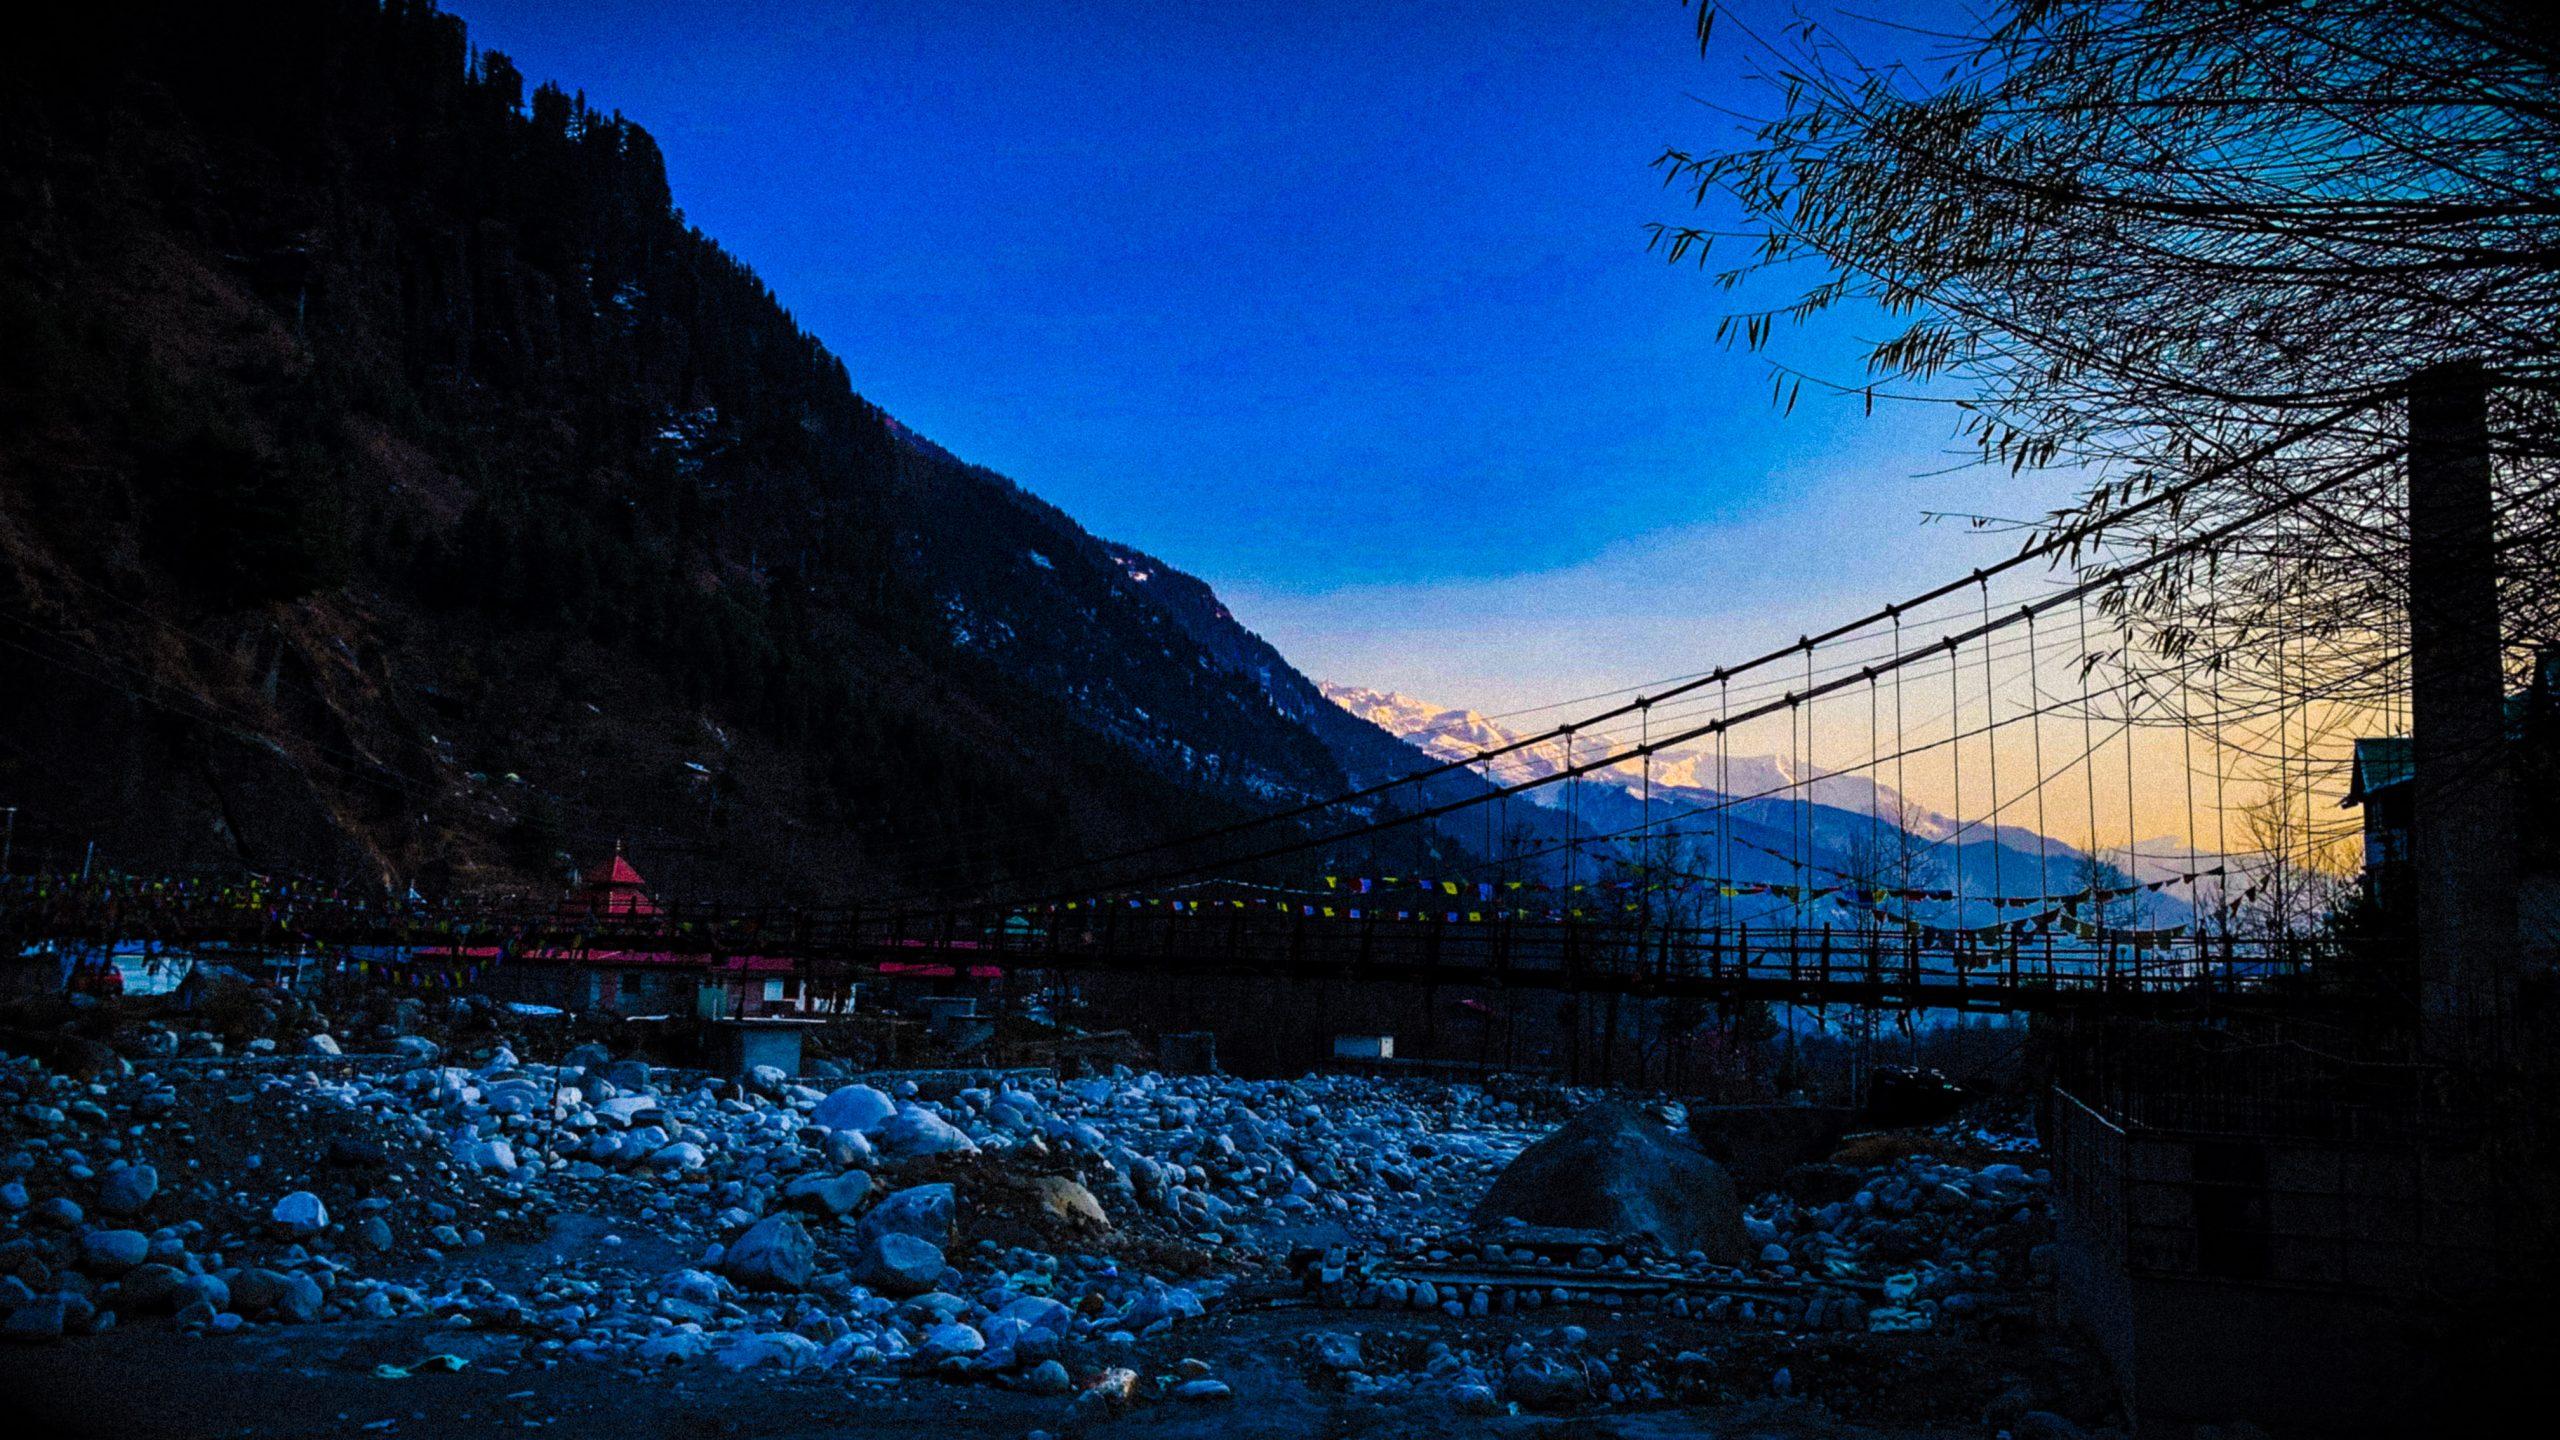 Malana village in Himachal Pradesh